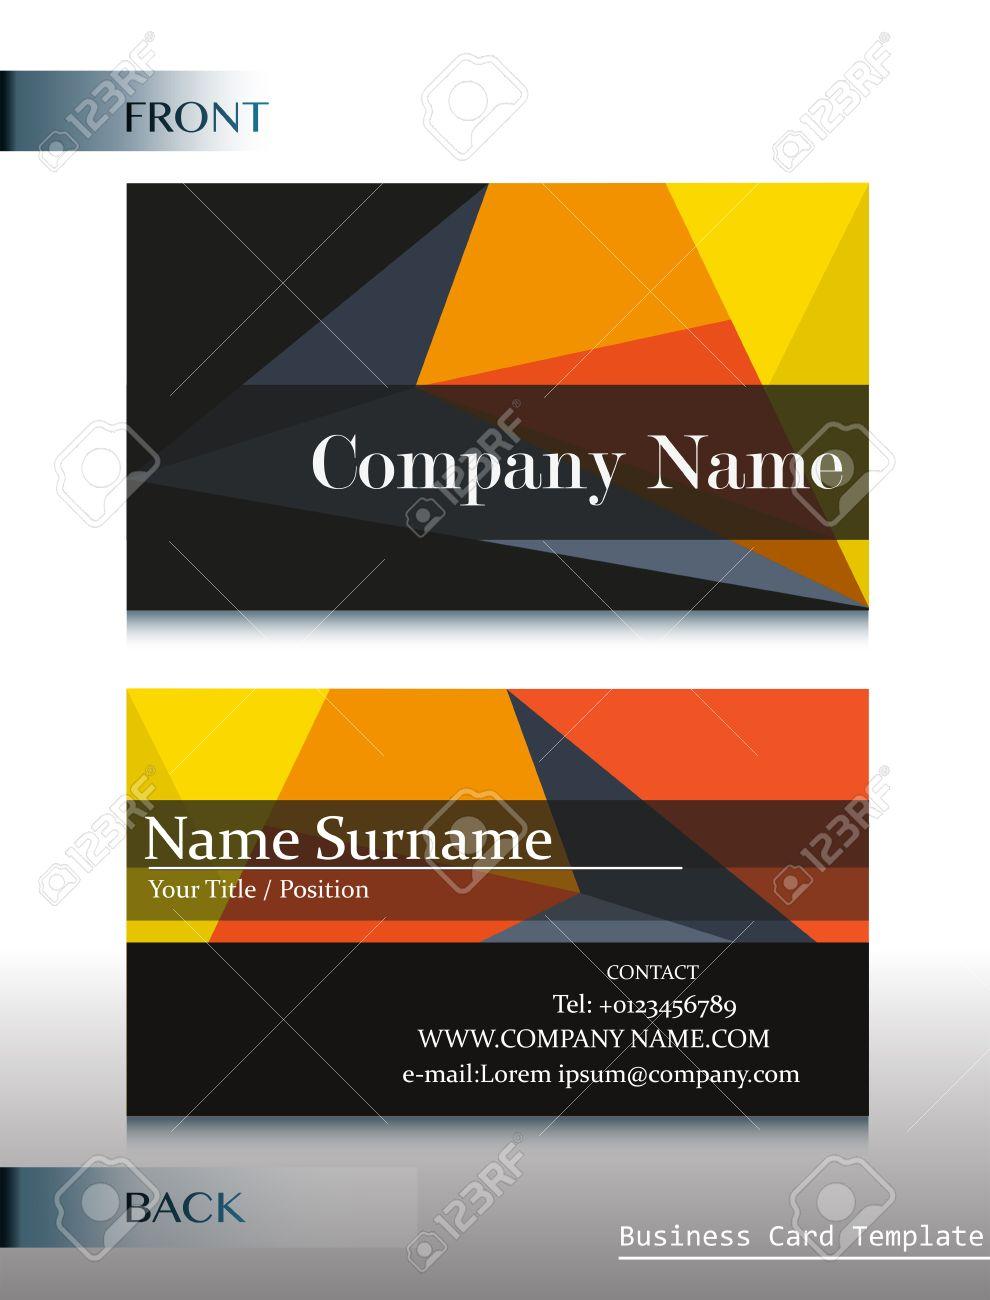 A company calling card template royalty free cliparts vectors and a company calling card template stock vector 34469955 flashek Choice Image